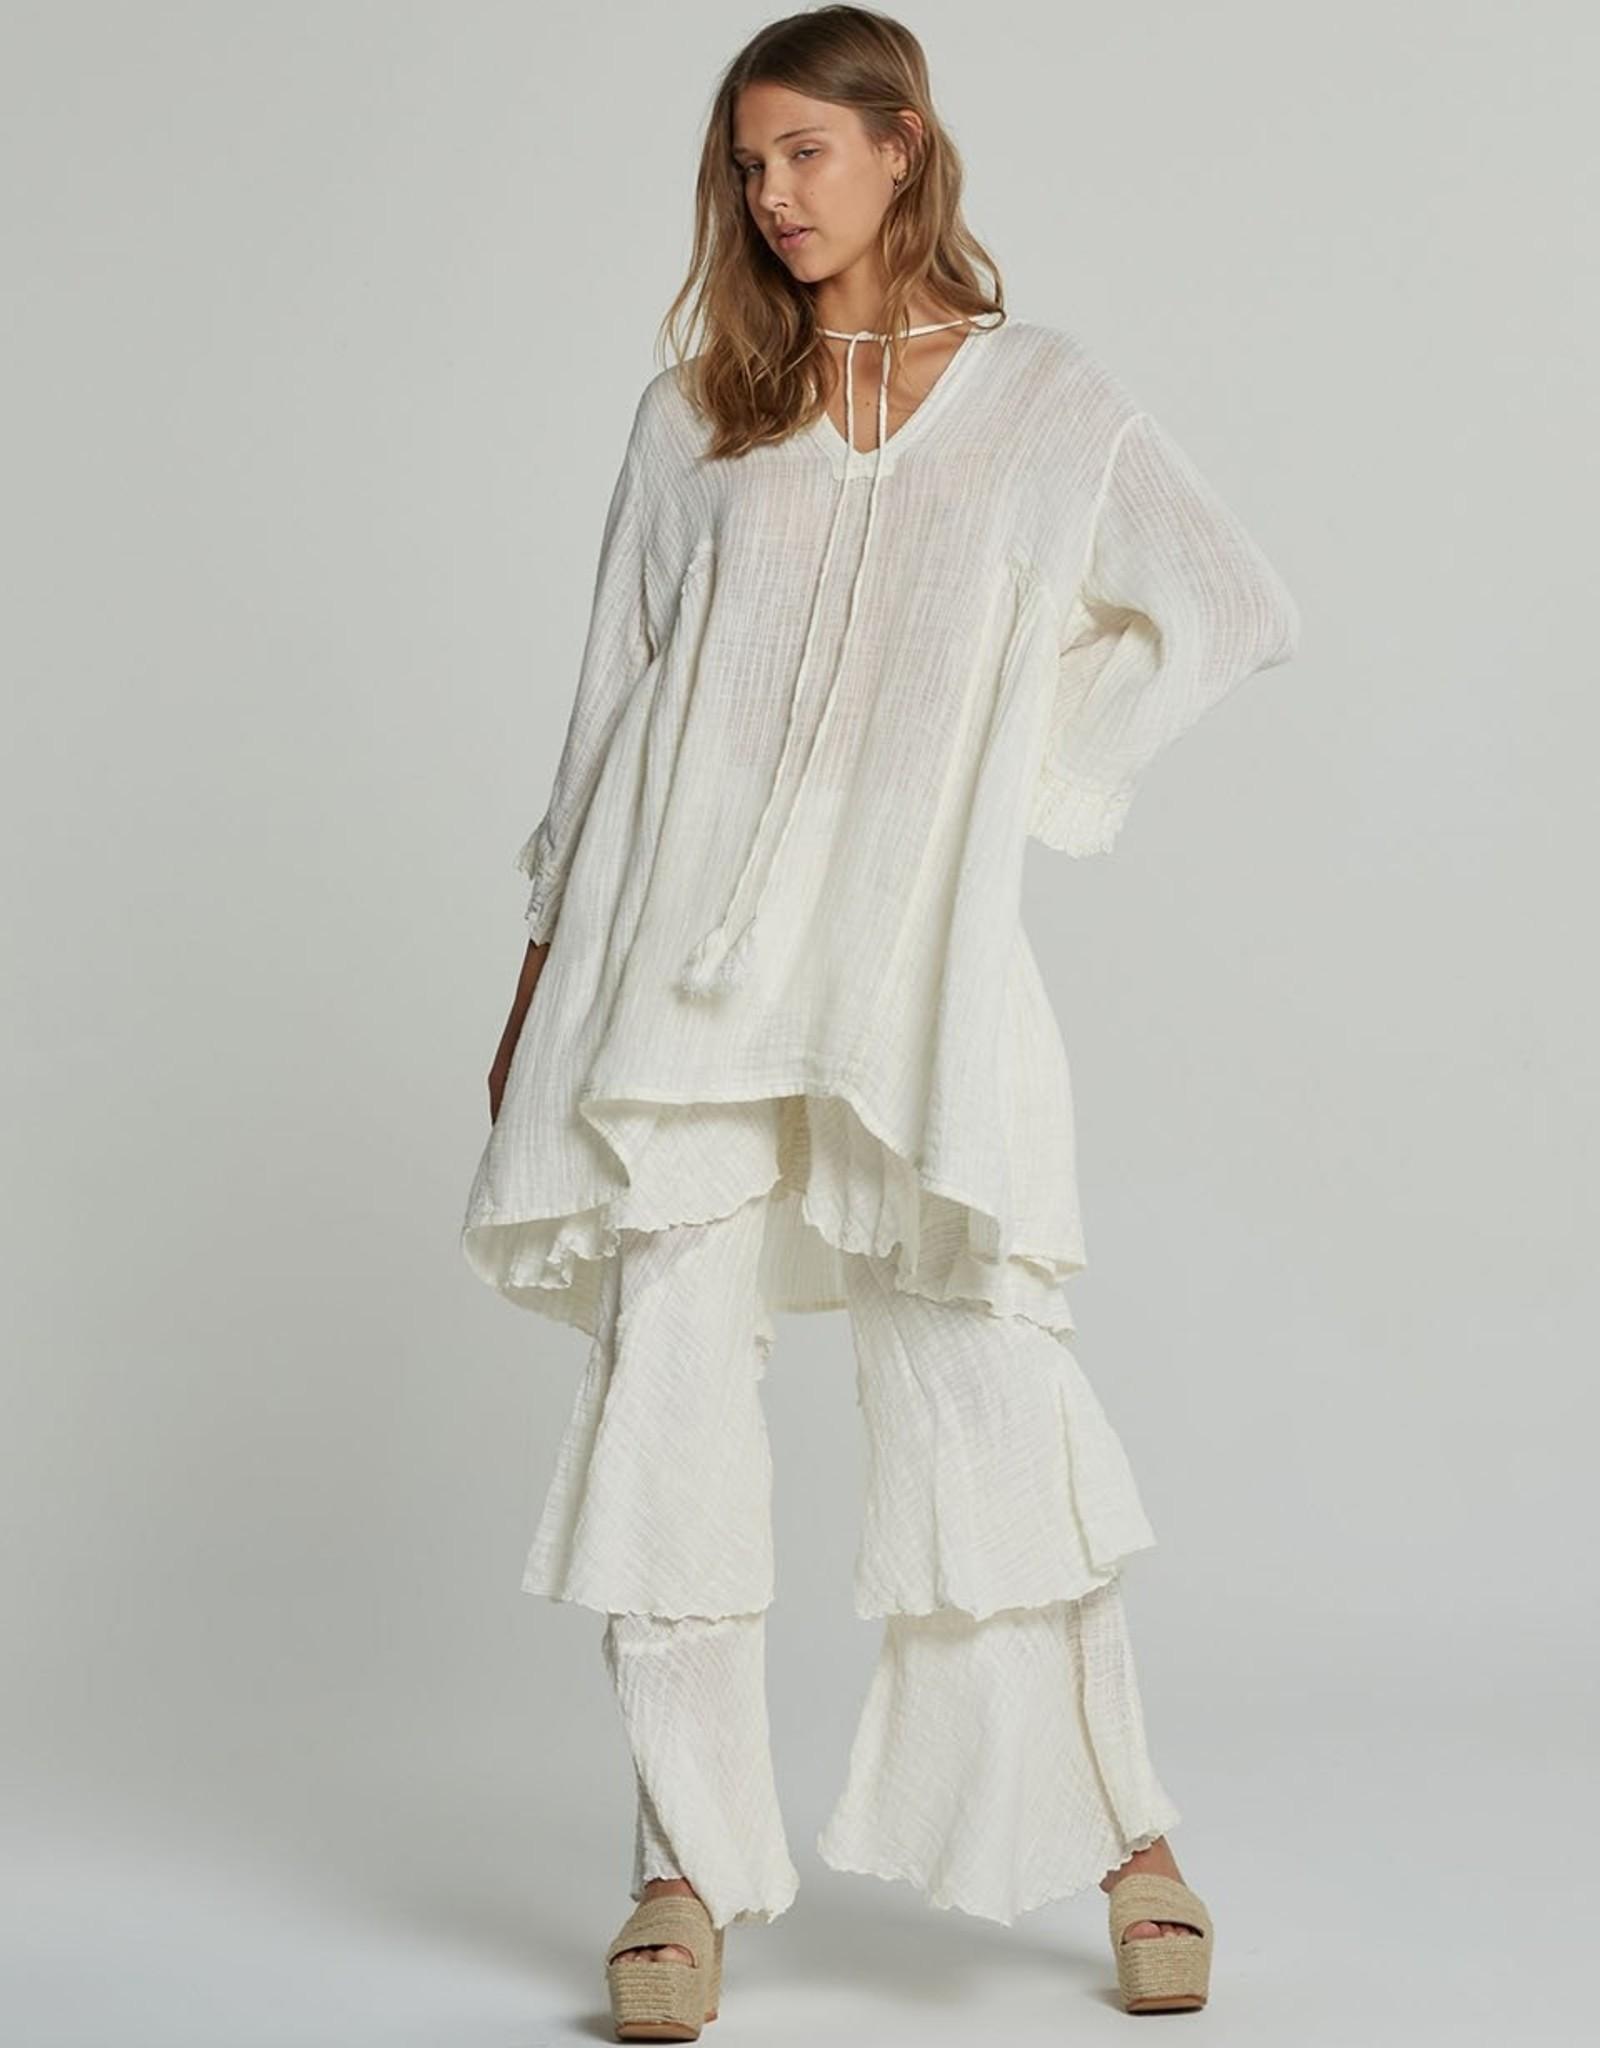 ESTILO EMPORIO LENI DRESS SCORPIONE PANNA